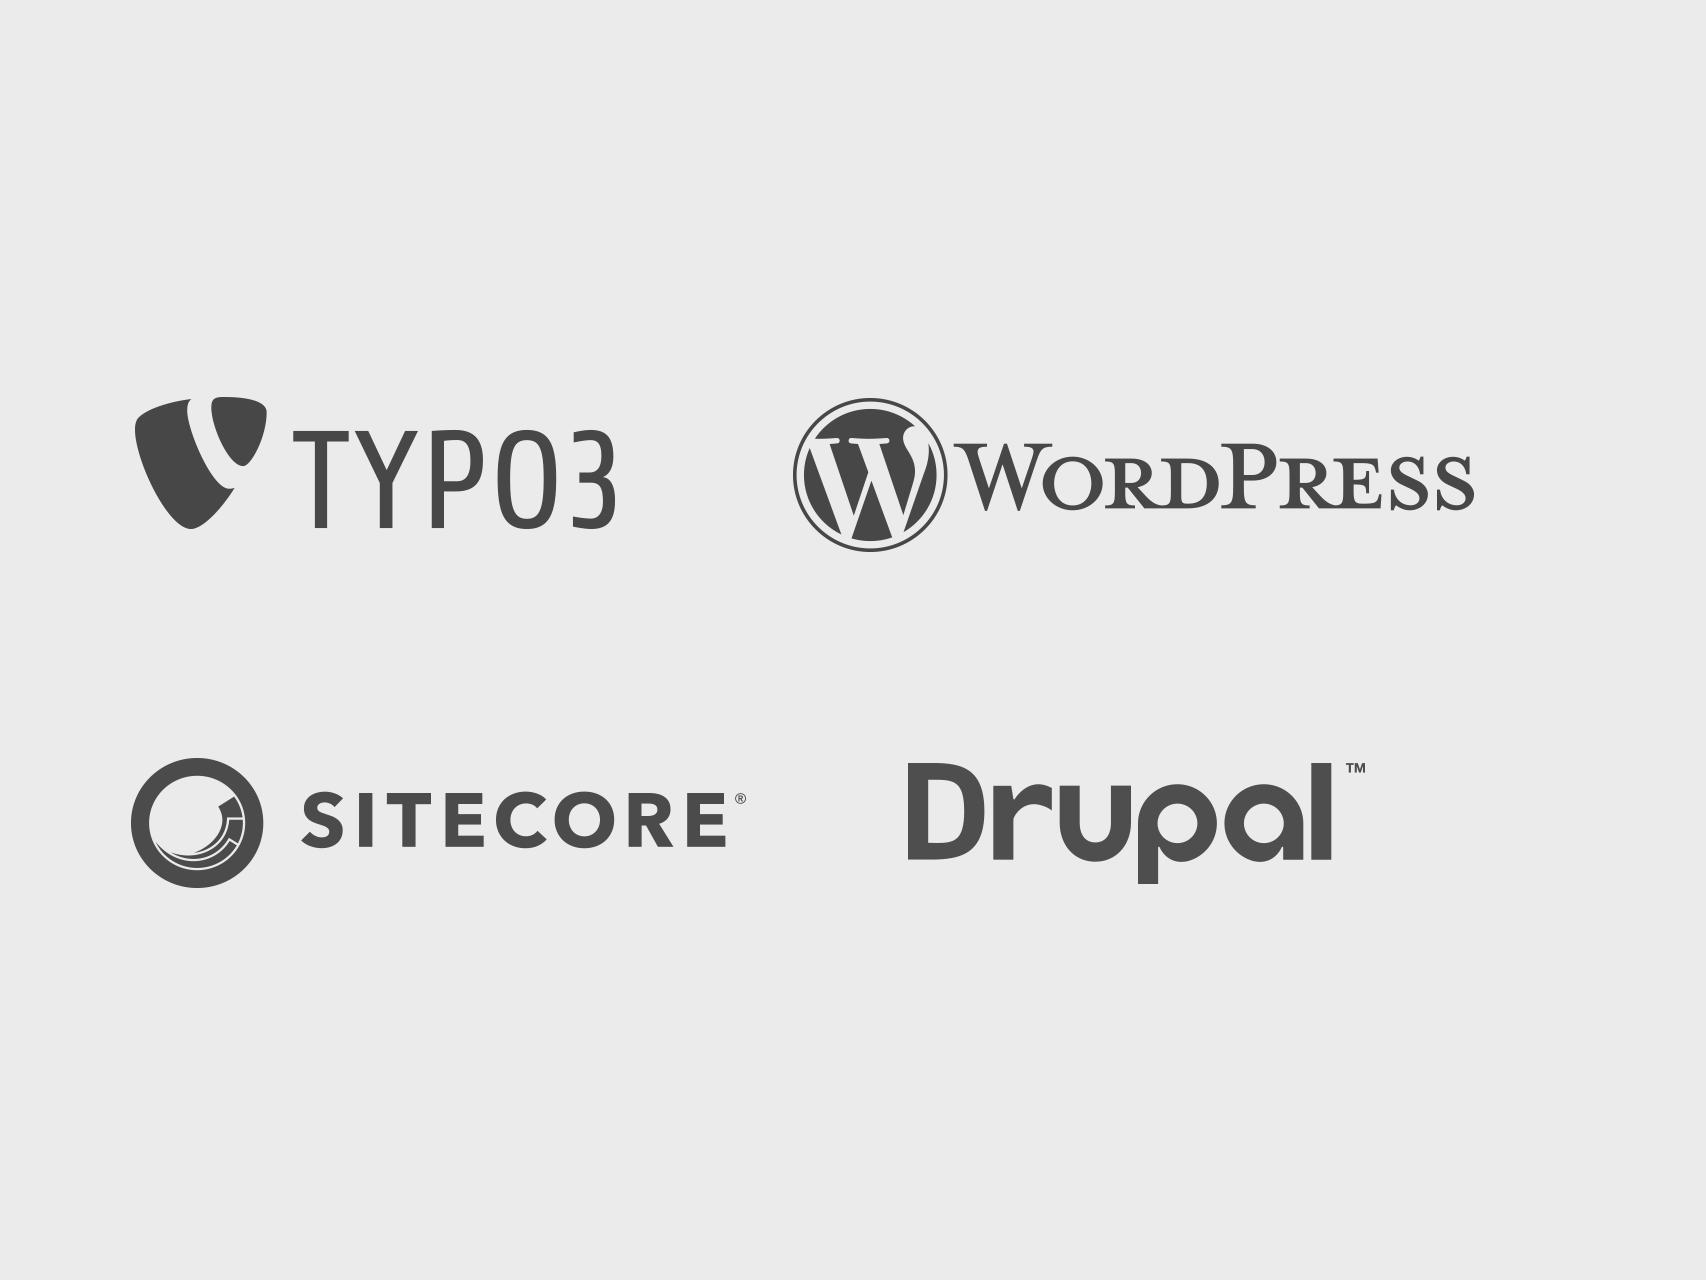 Webentwicklung: Typo3, WordPress, Sitecore, Drupal